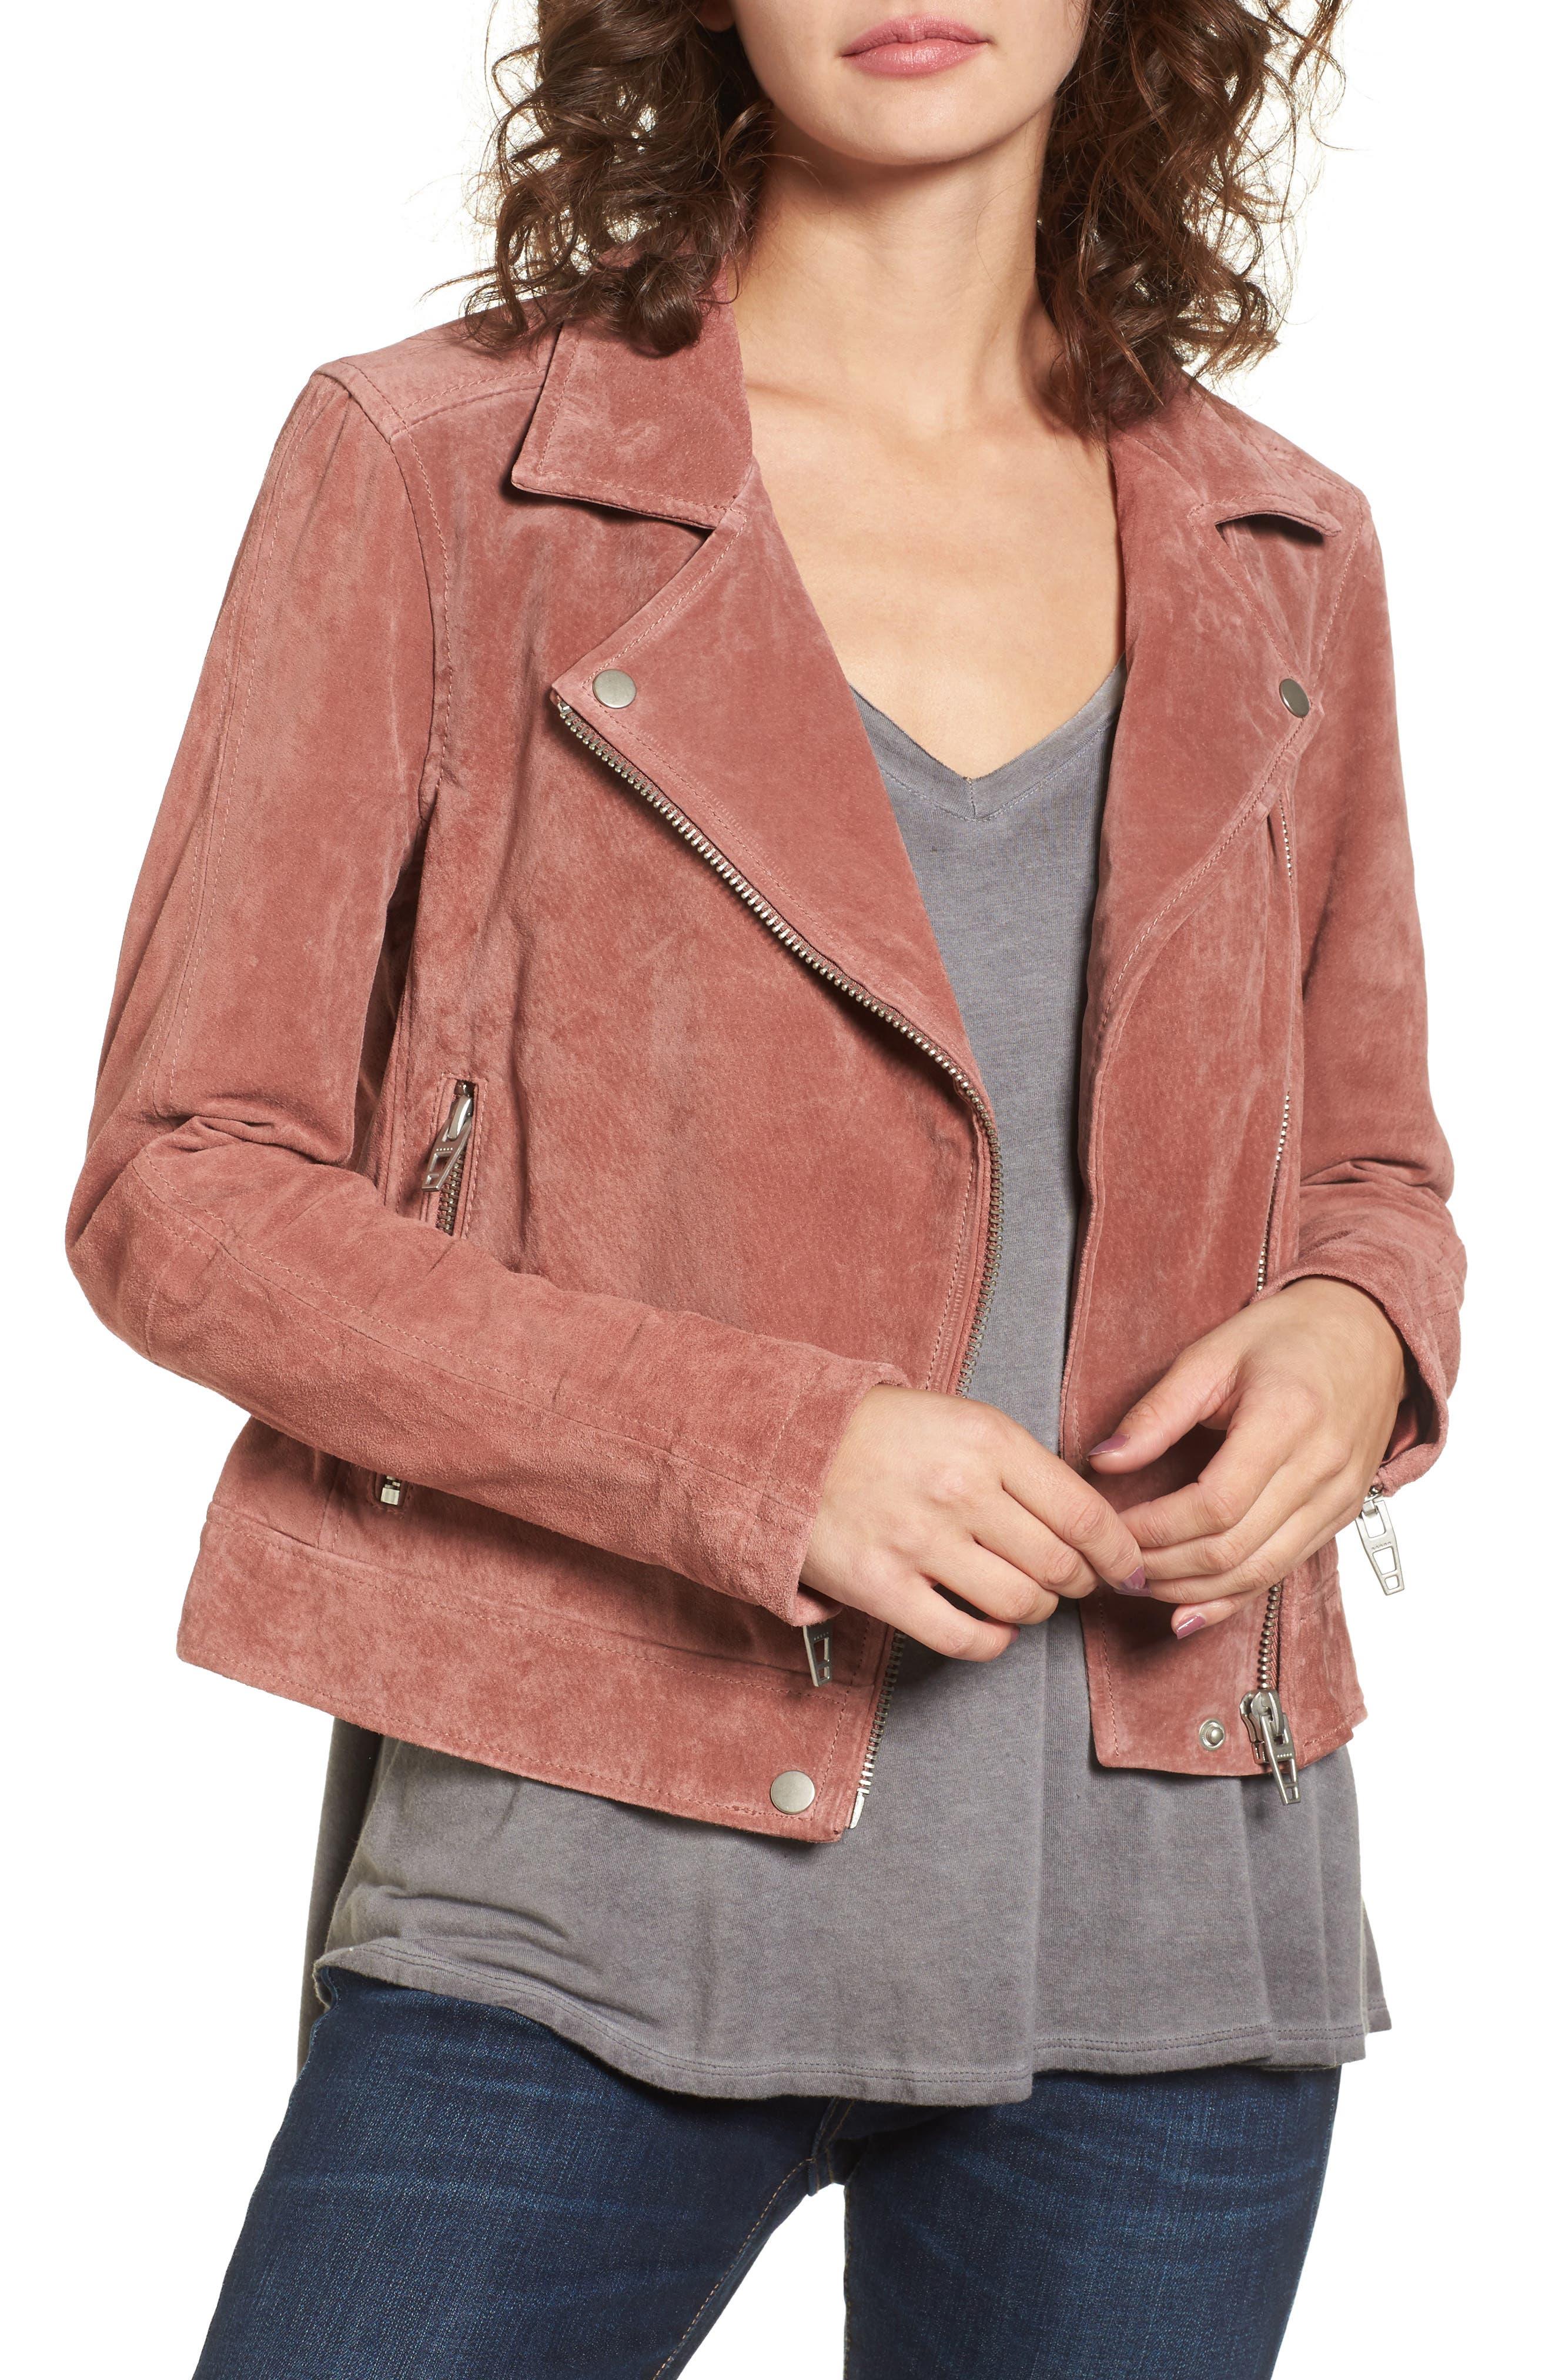 BLANKNYC, Suede Moto Jacket, Main thumbnail 1, color, 201